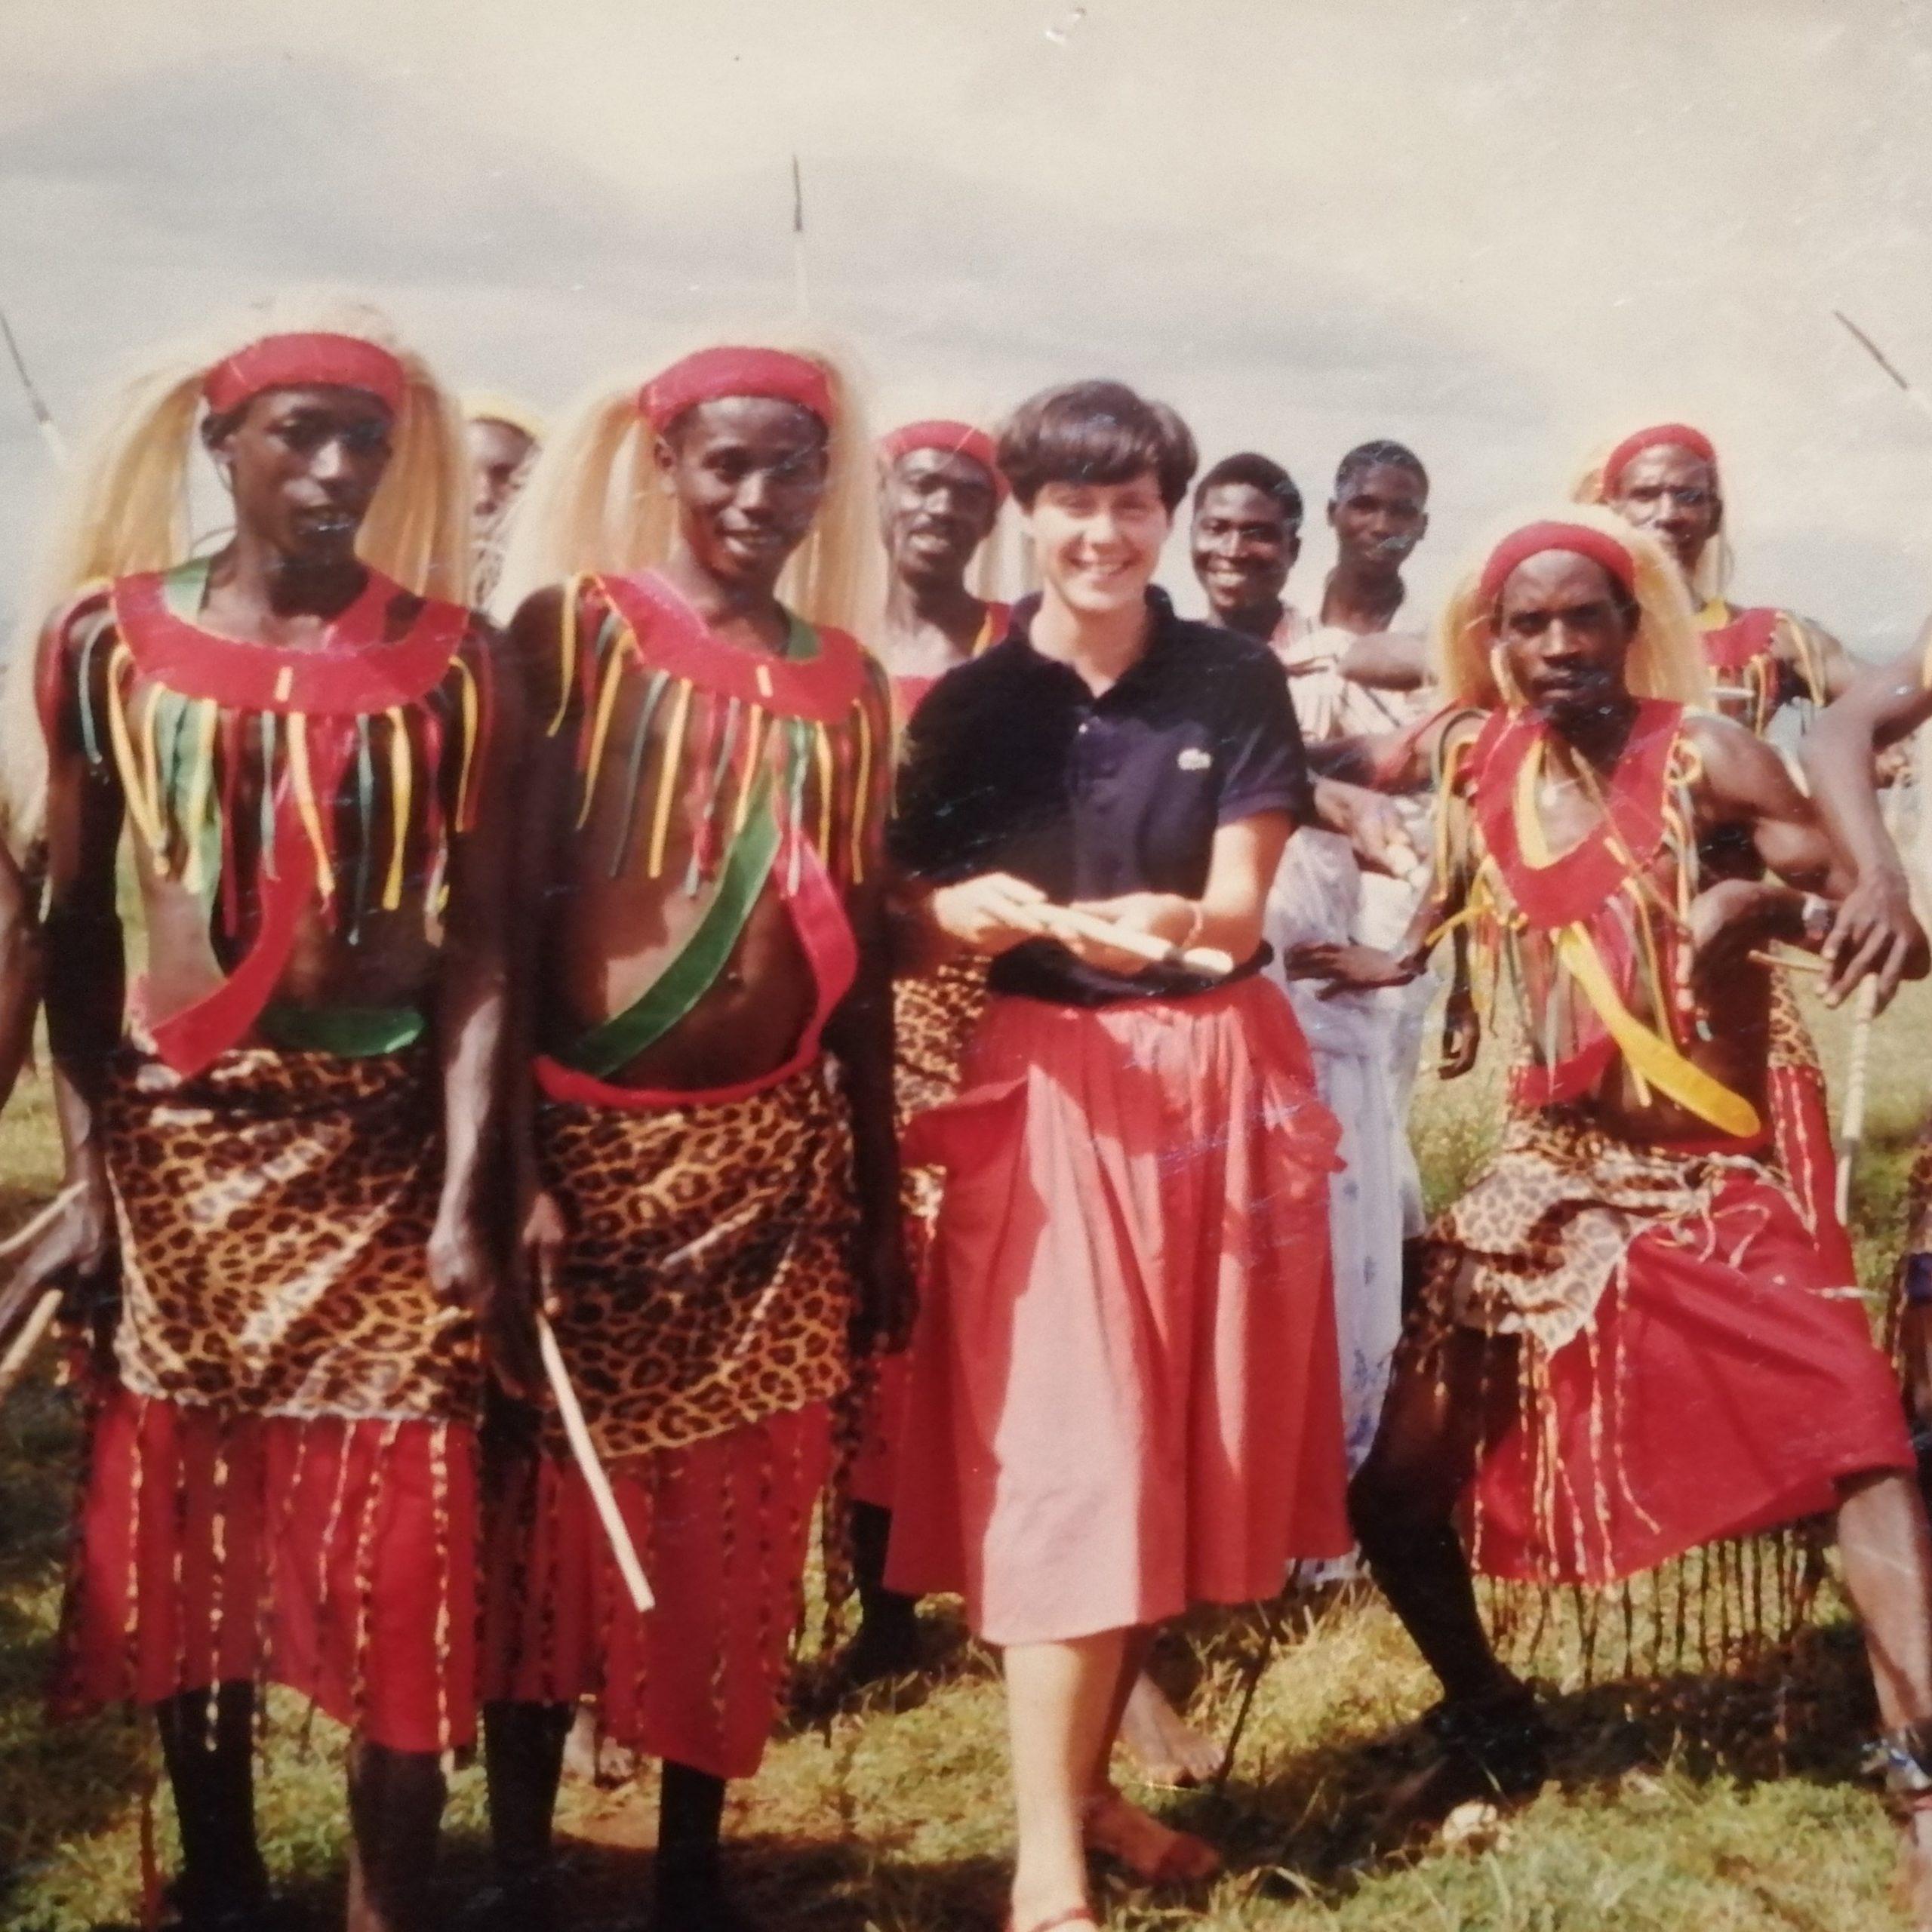 Armelle DUPONT – Rwanda